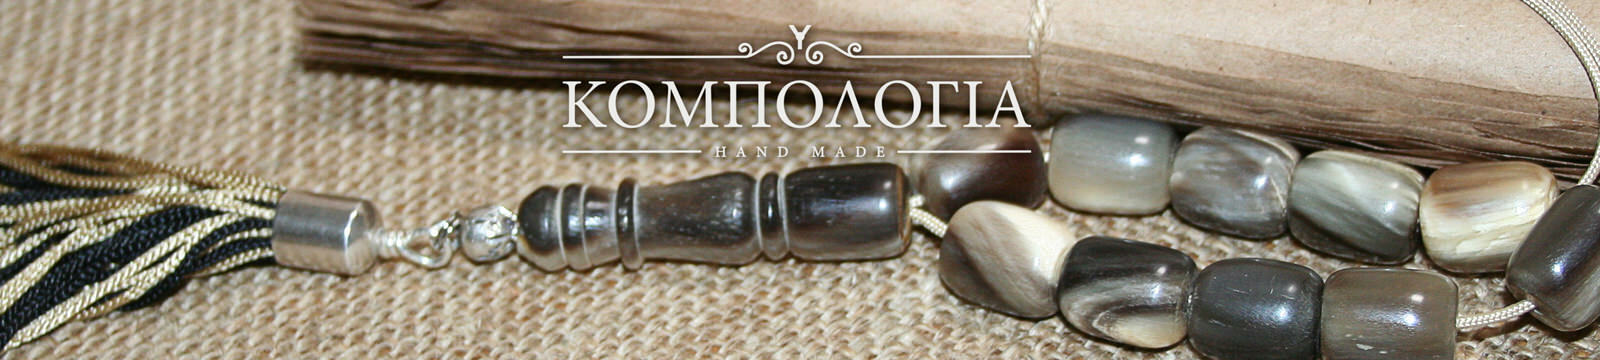 Kombologia Handmade